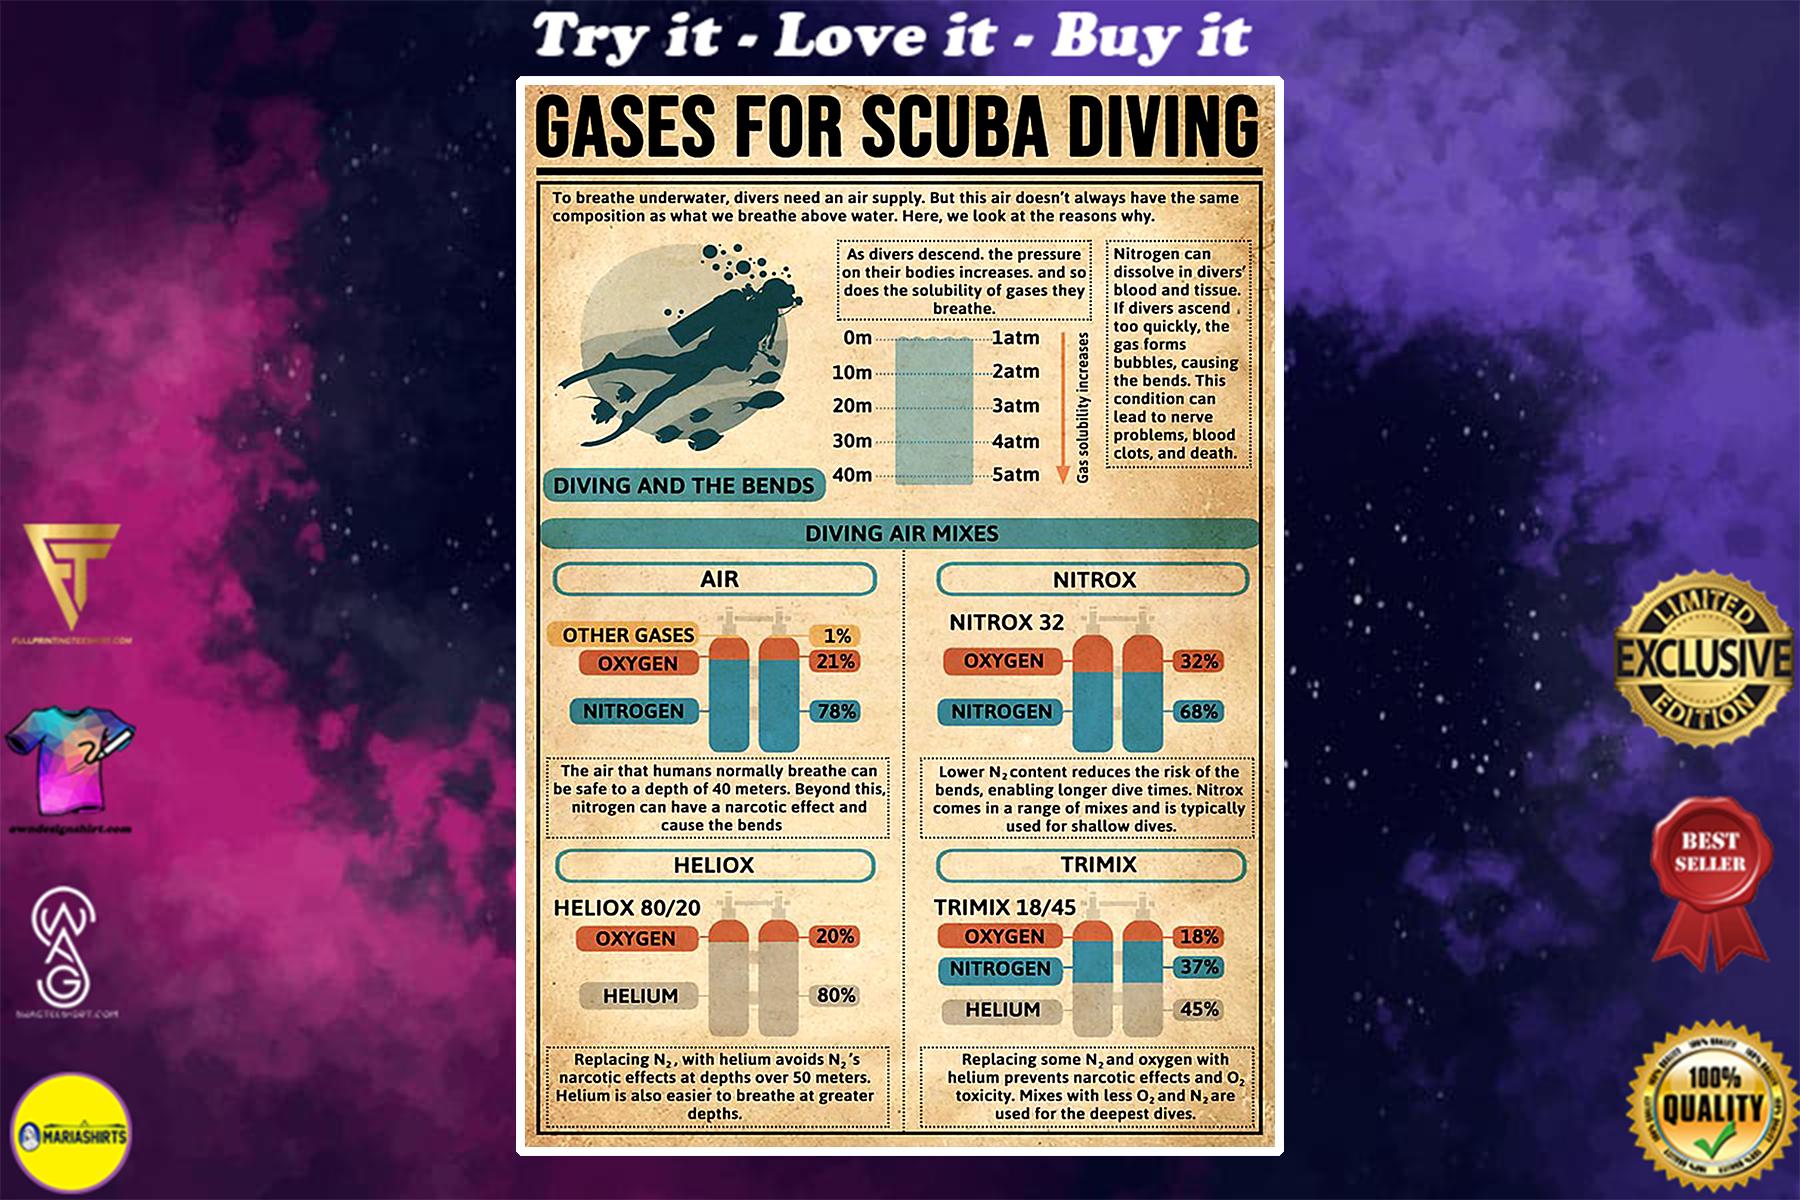 vintage gases for scuba diving poster